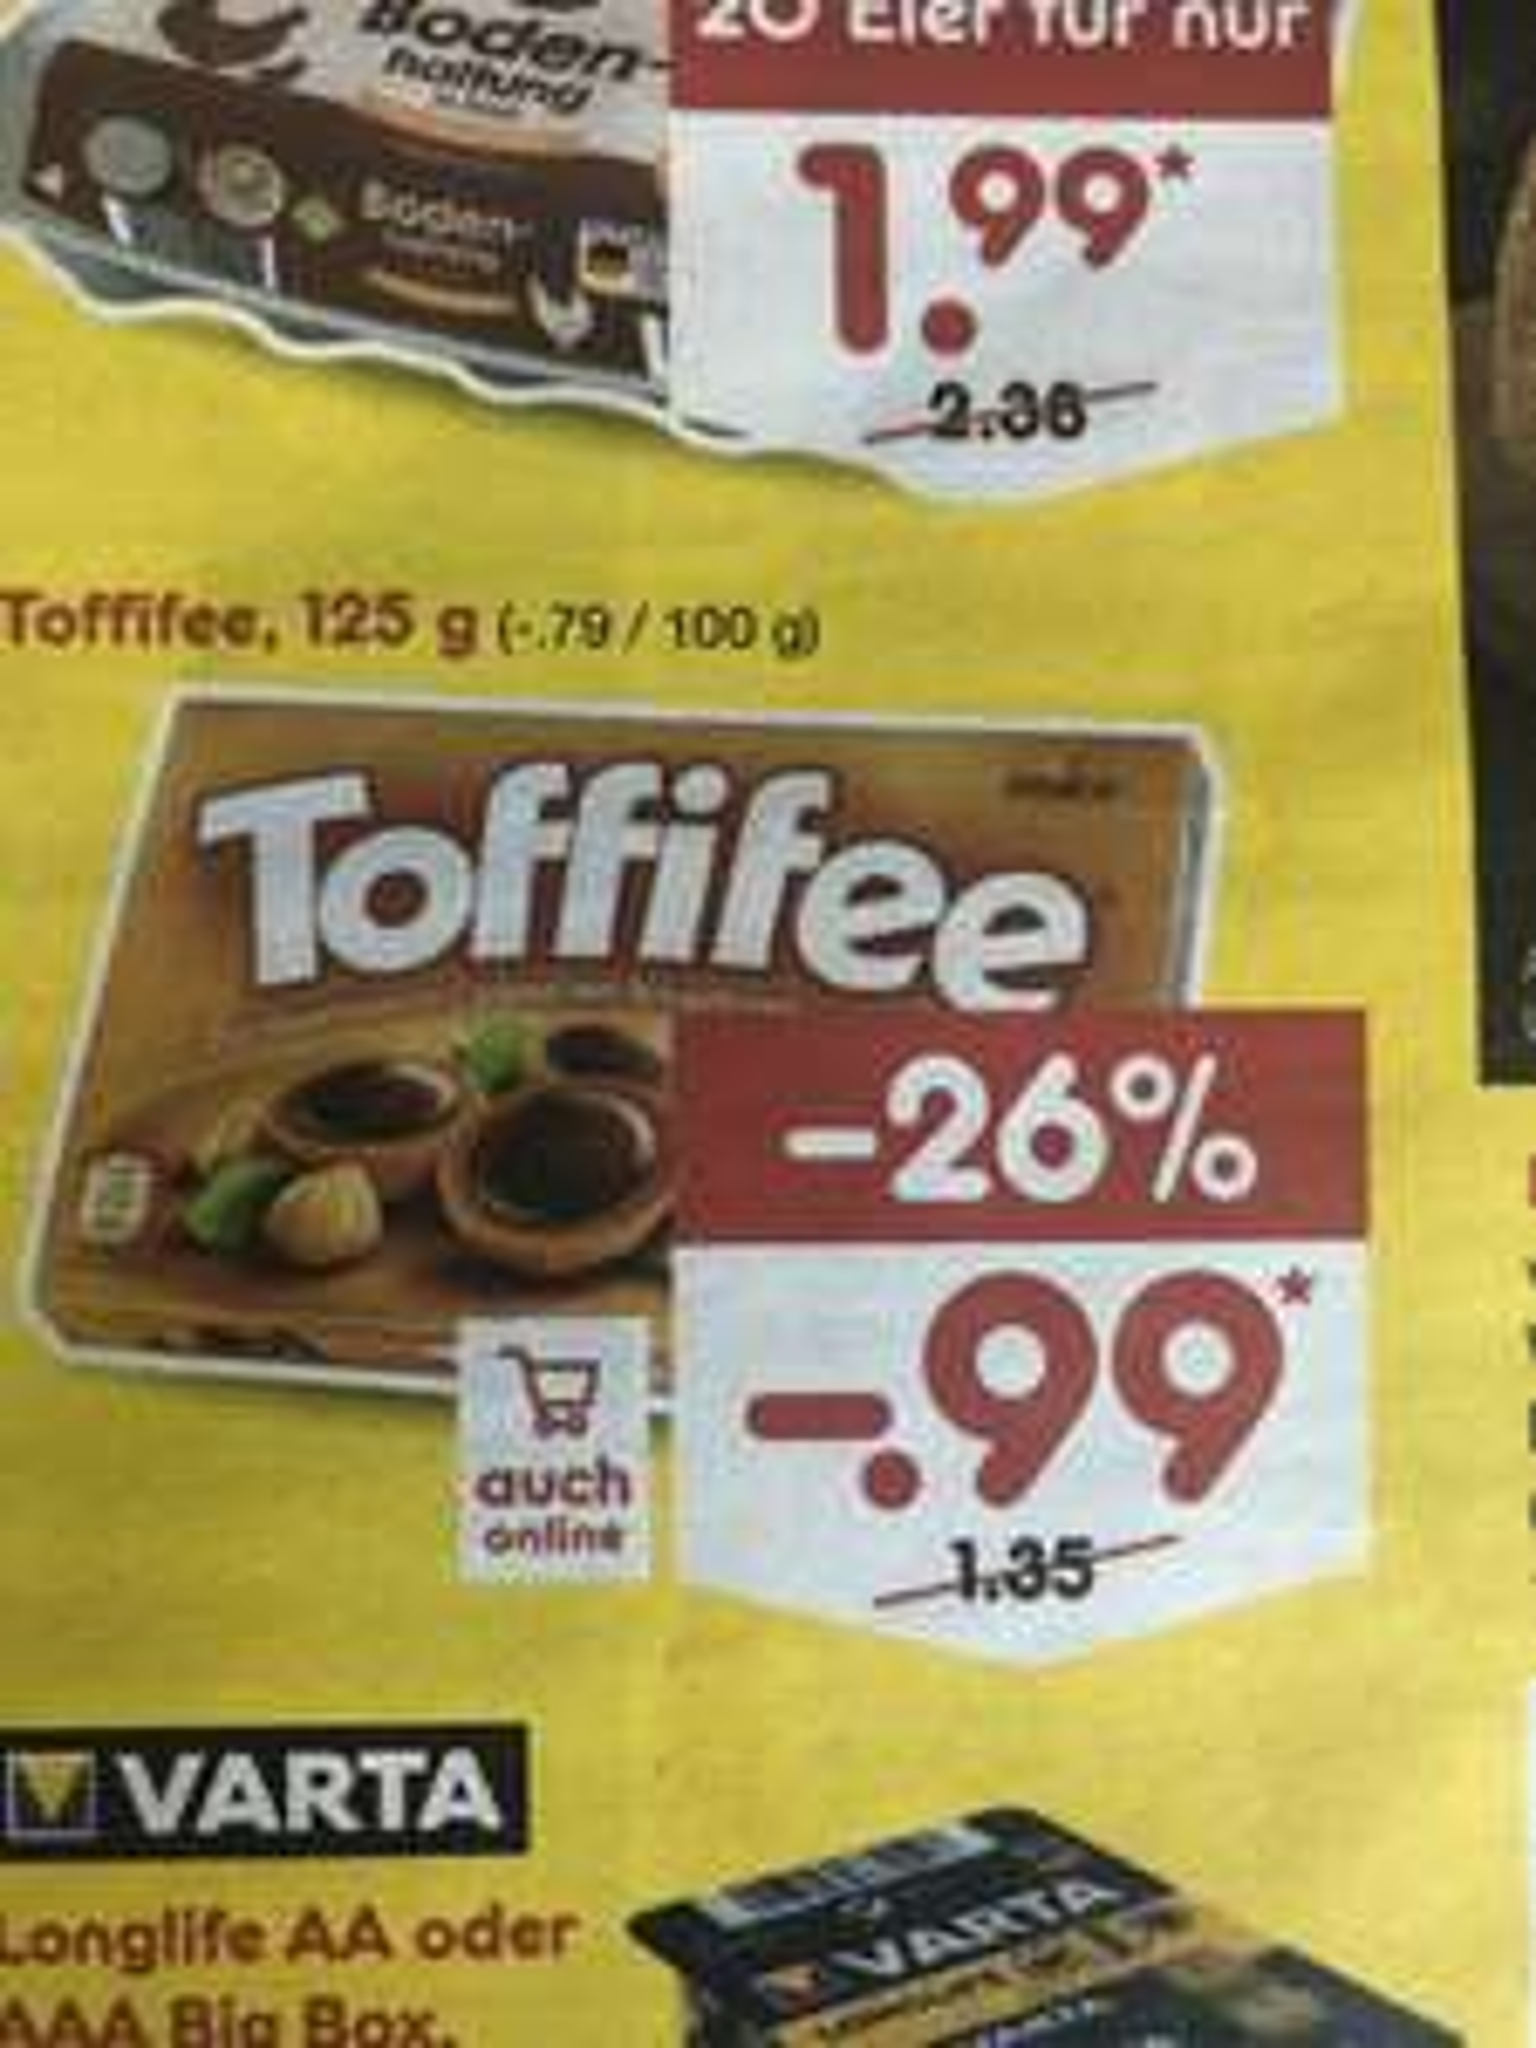 Netto MD Toffifee 125g 0,99€